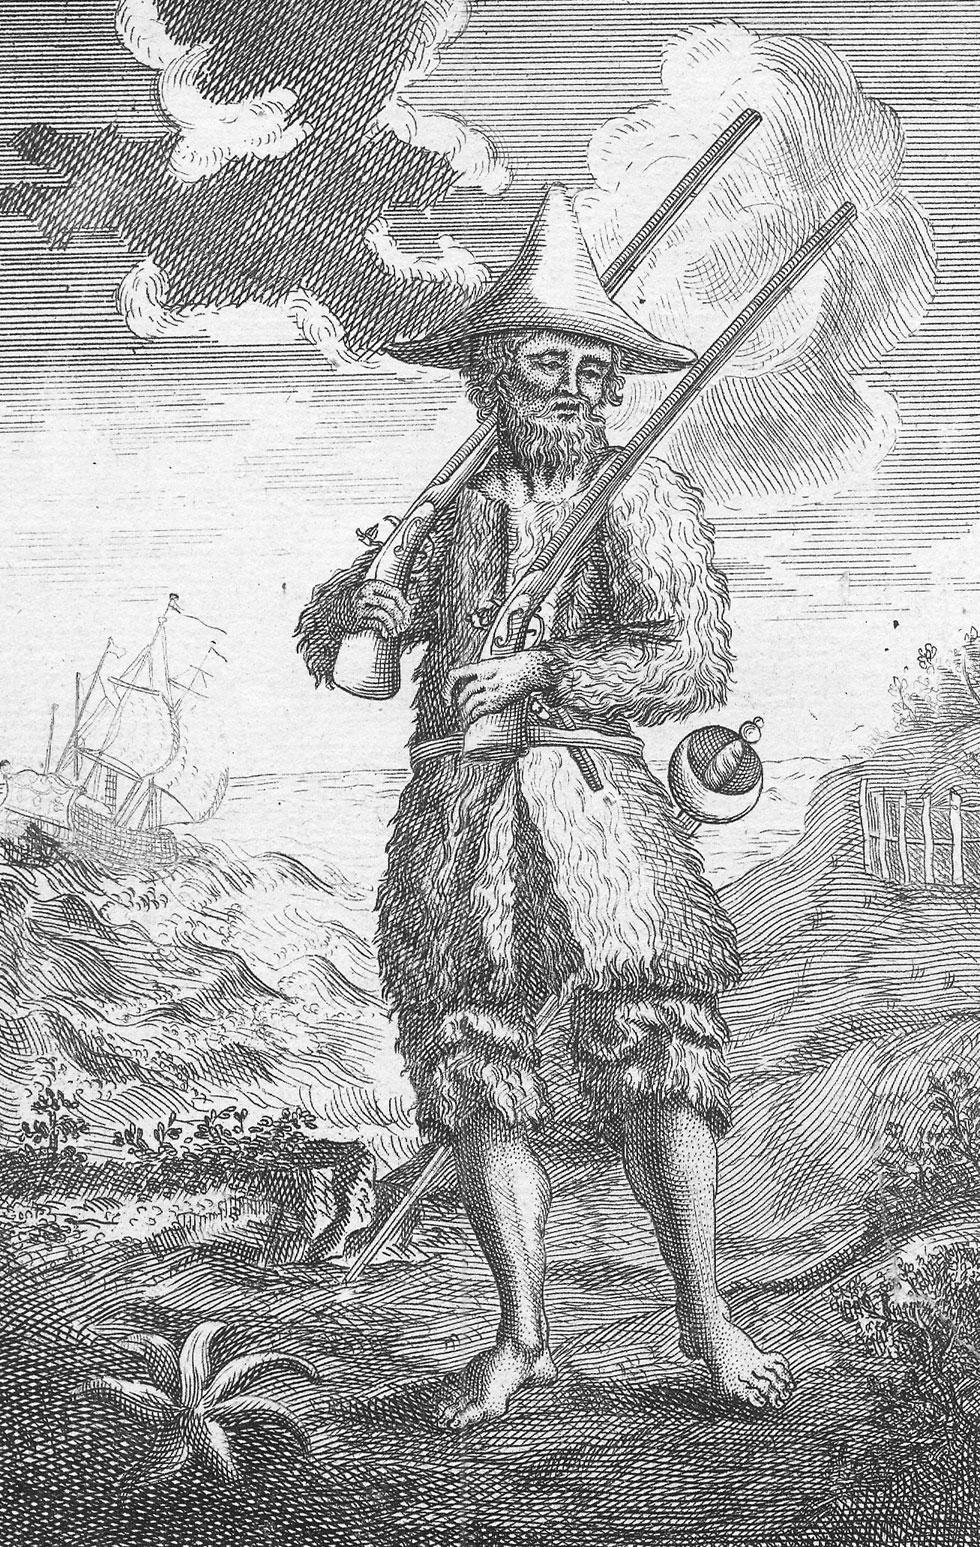 Robinson Crusoe, Daniel Defoe, 1719.